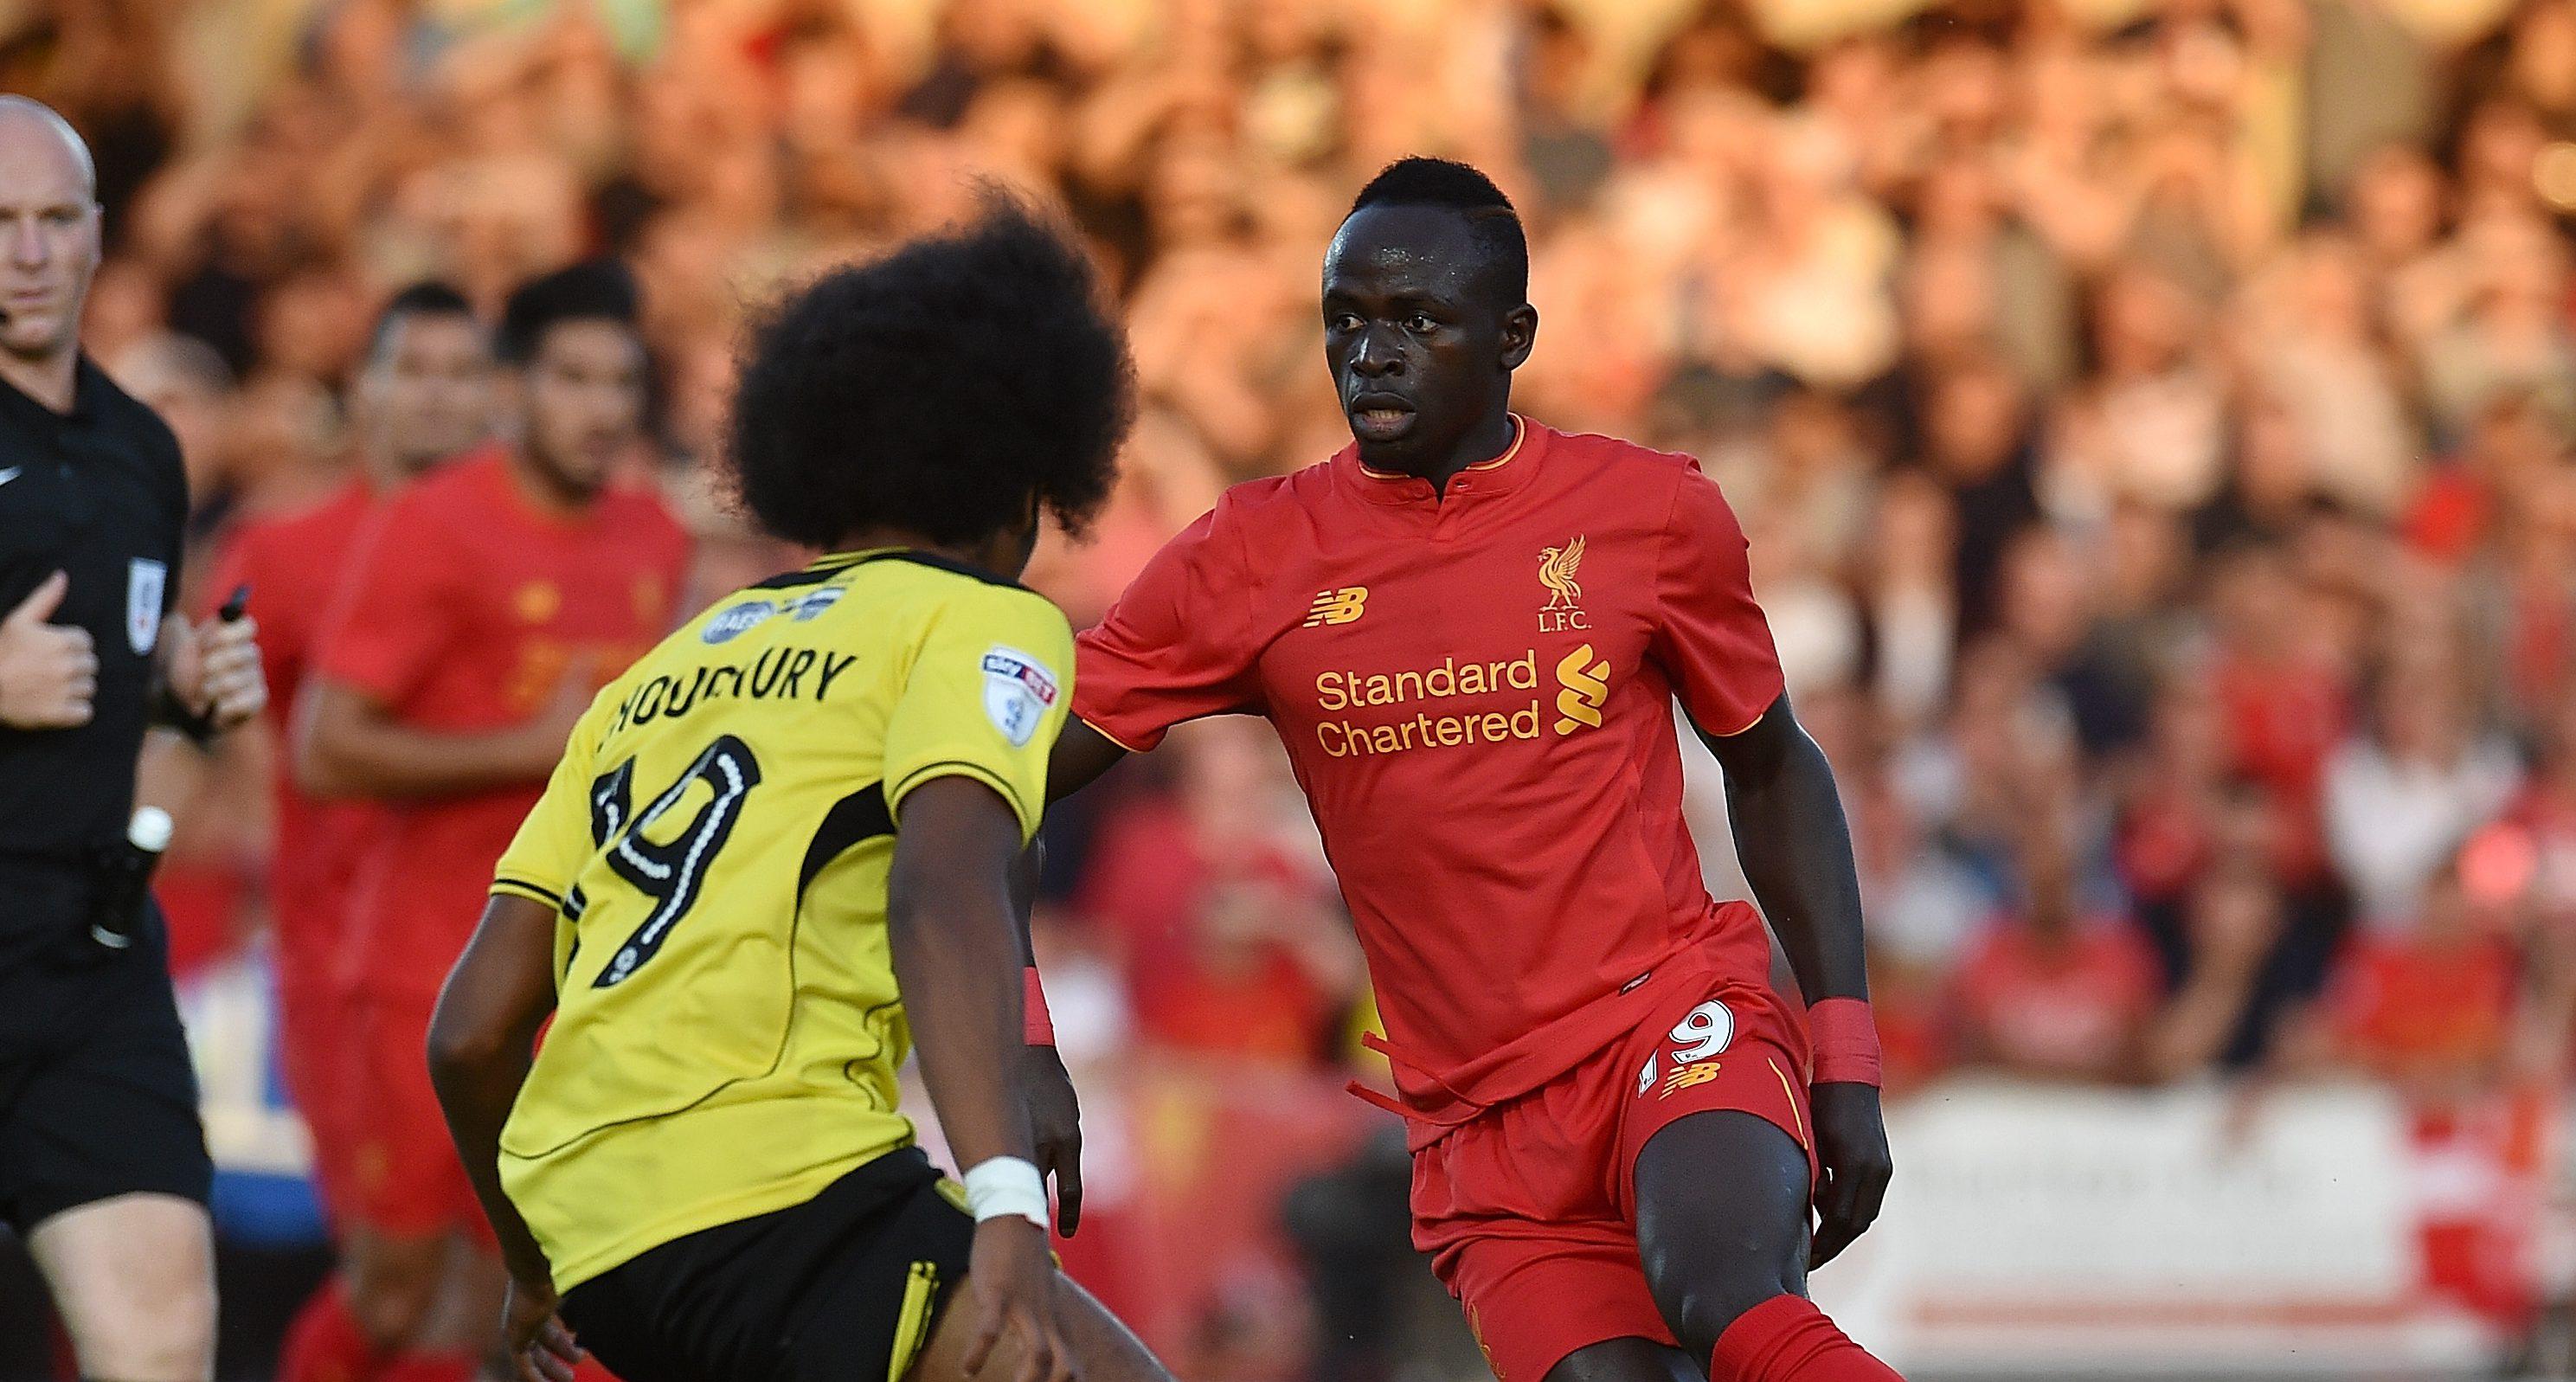 Sadio Mane steals the show as Liverpool thump Burton Albion 5-0 to reach EFL Cup third round